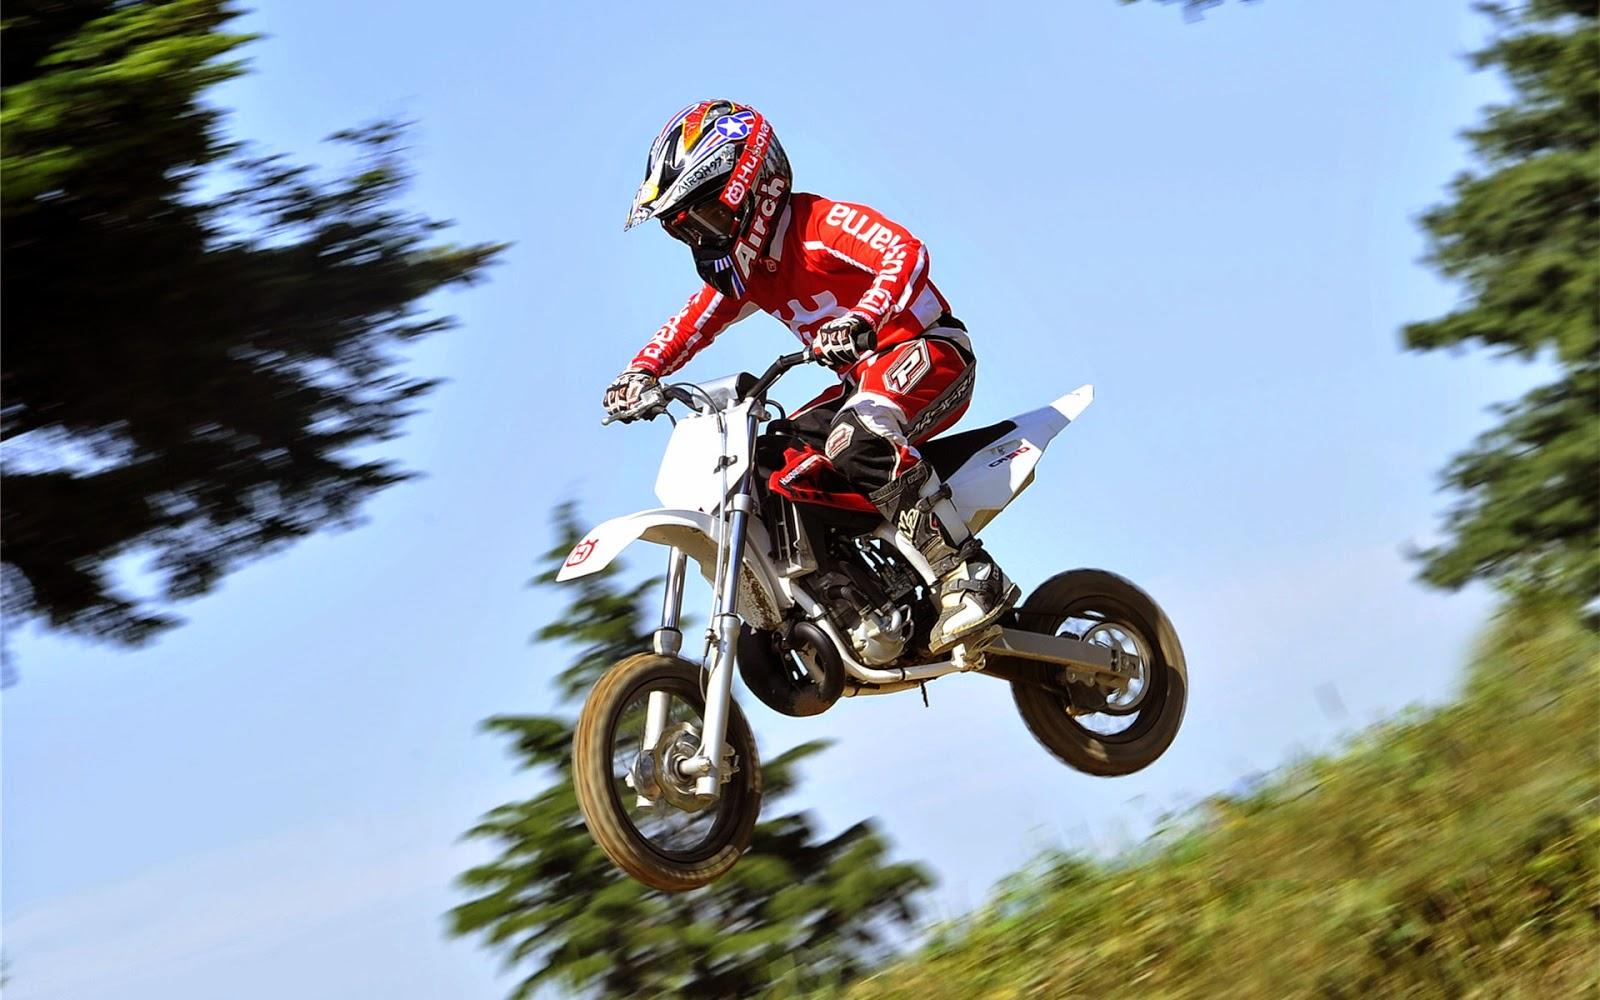 Husqvarna SM50 ADventures Motorcycles Price